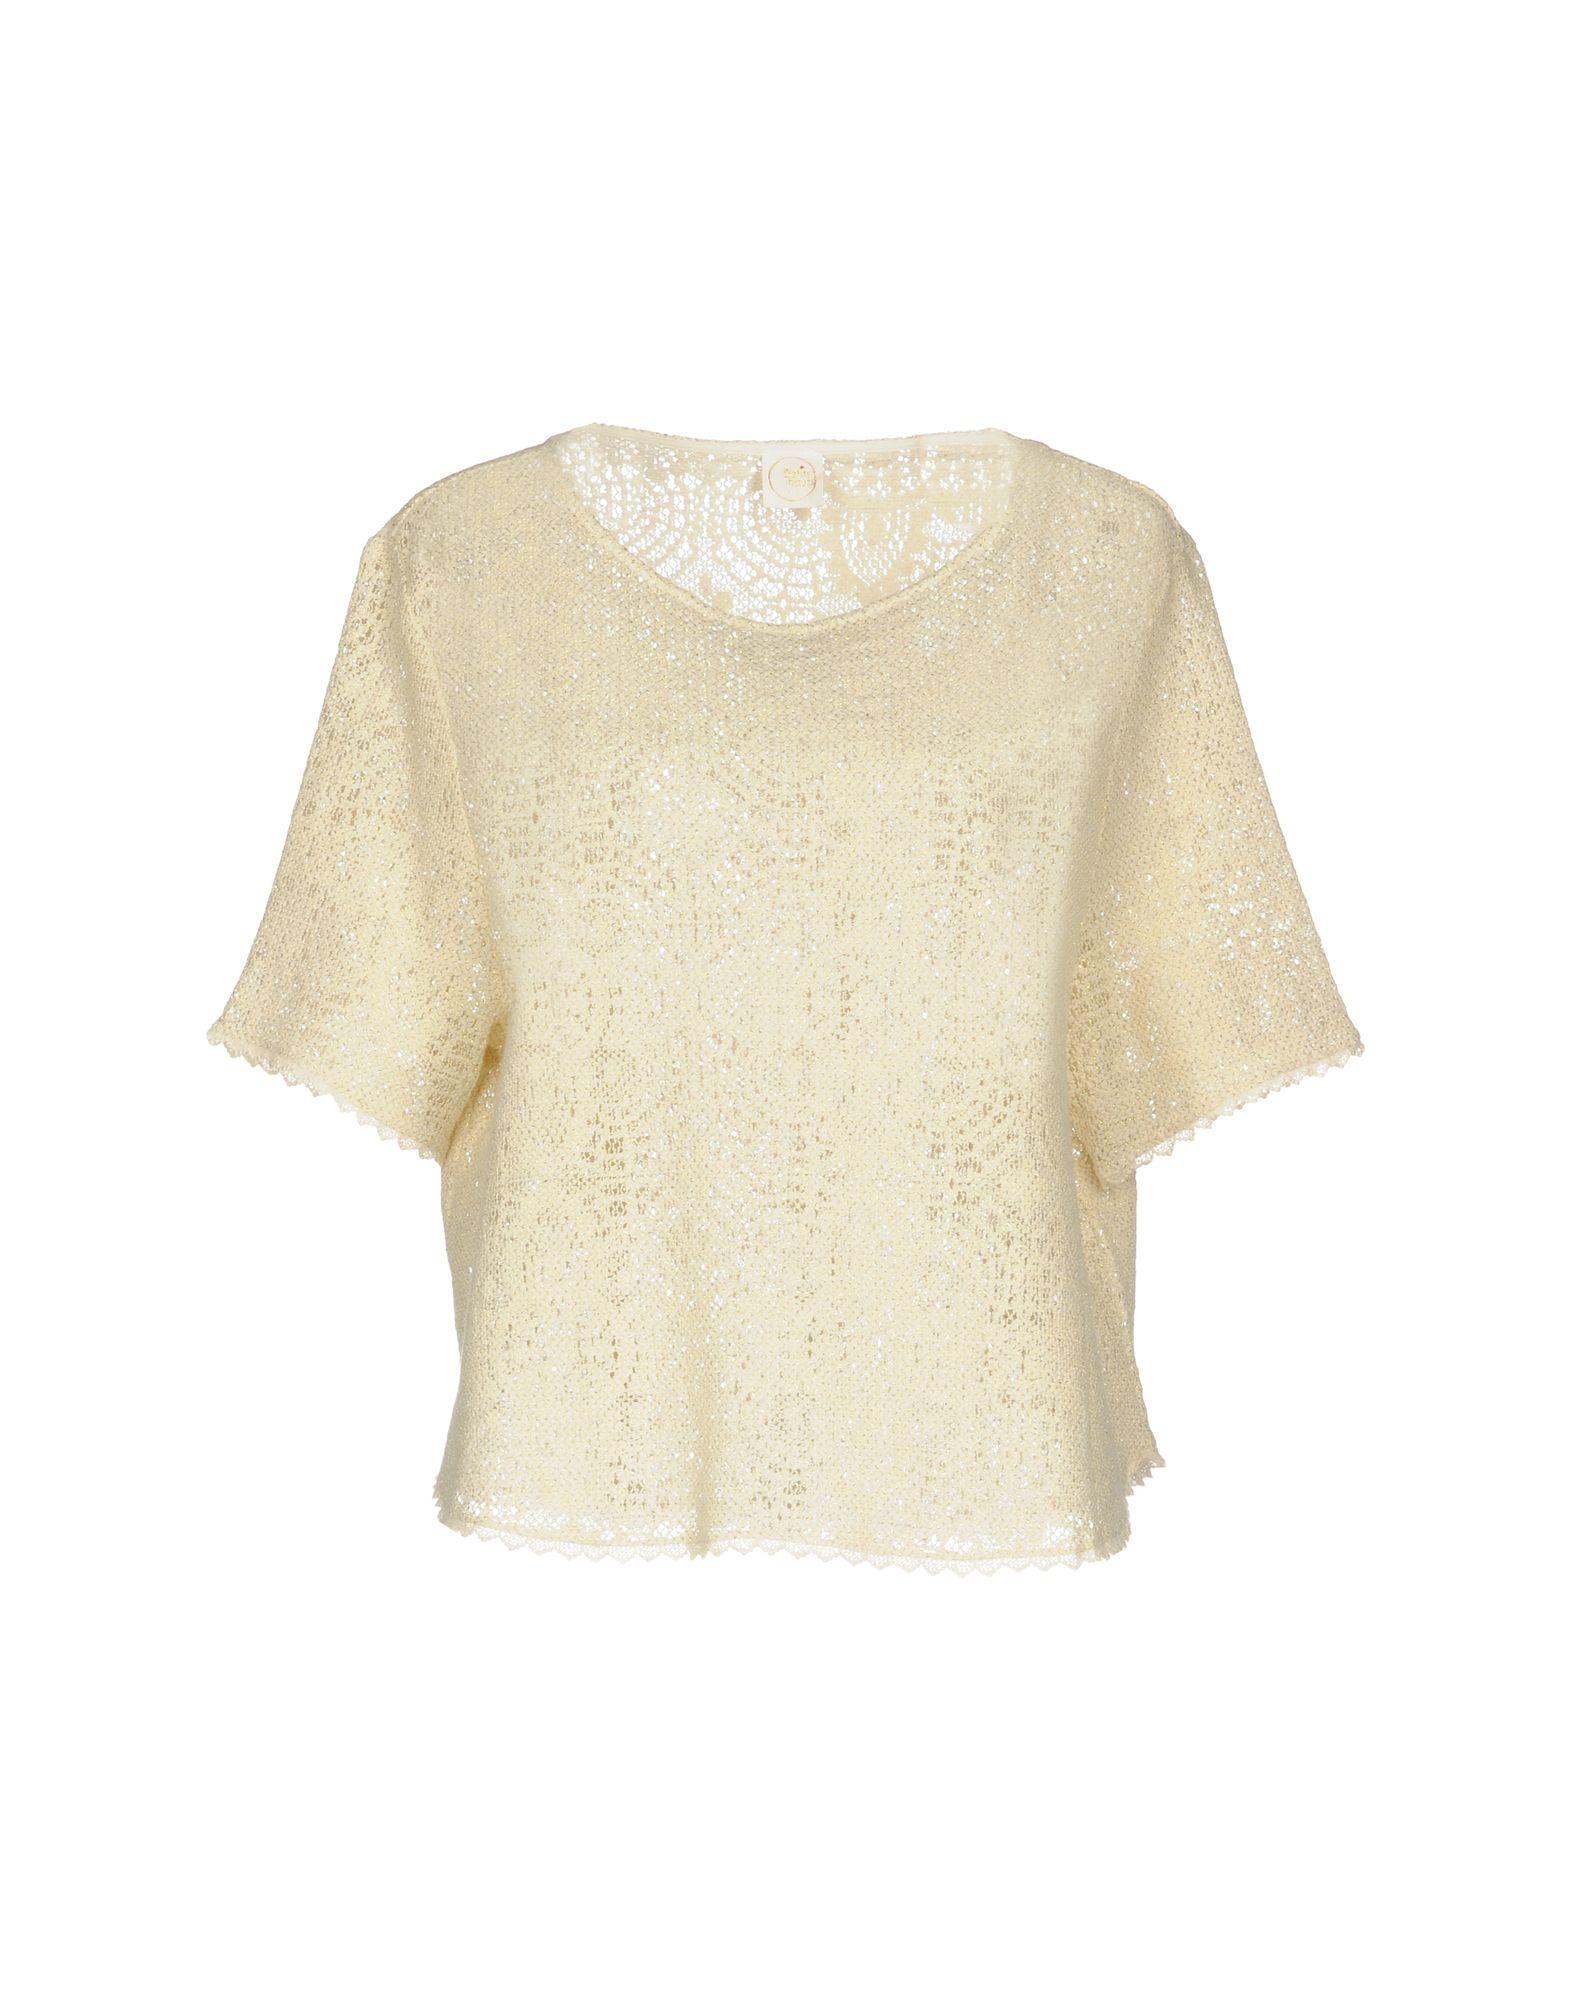 des petits hauts короткое платье DES PETITS HAUTS Блузка